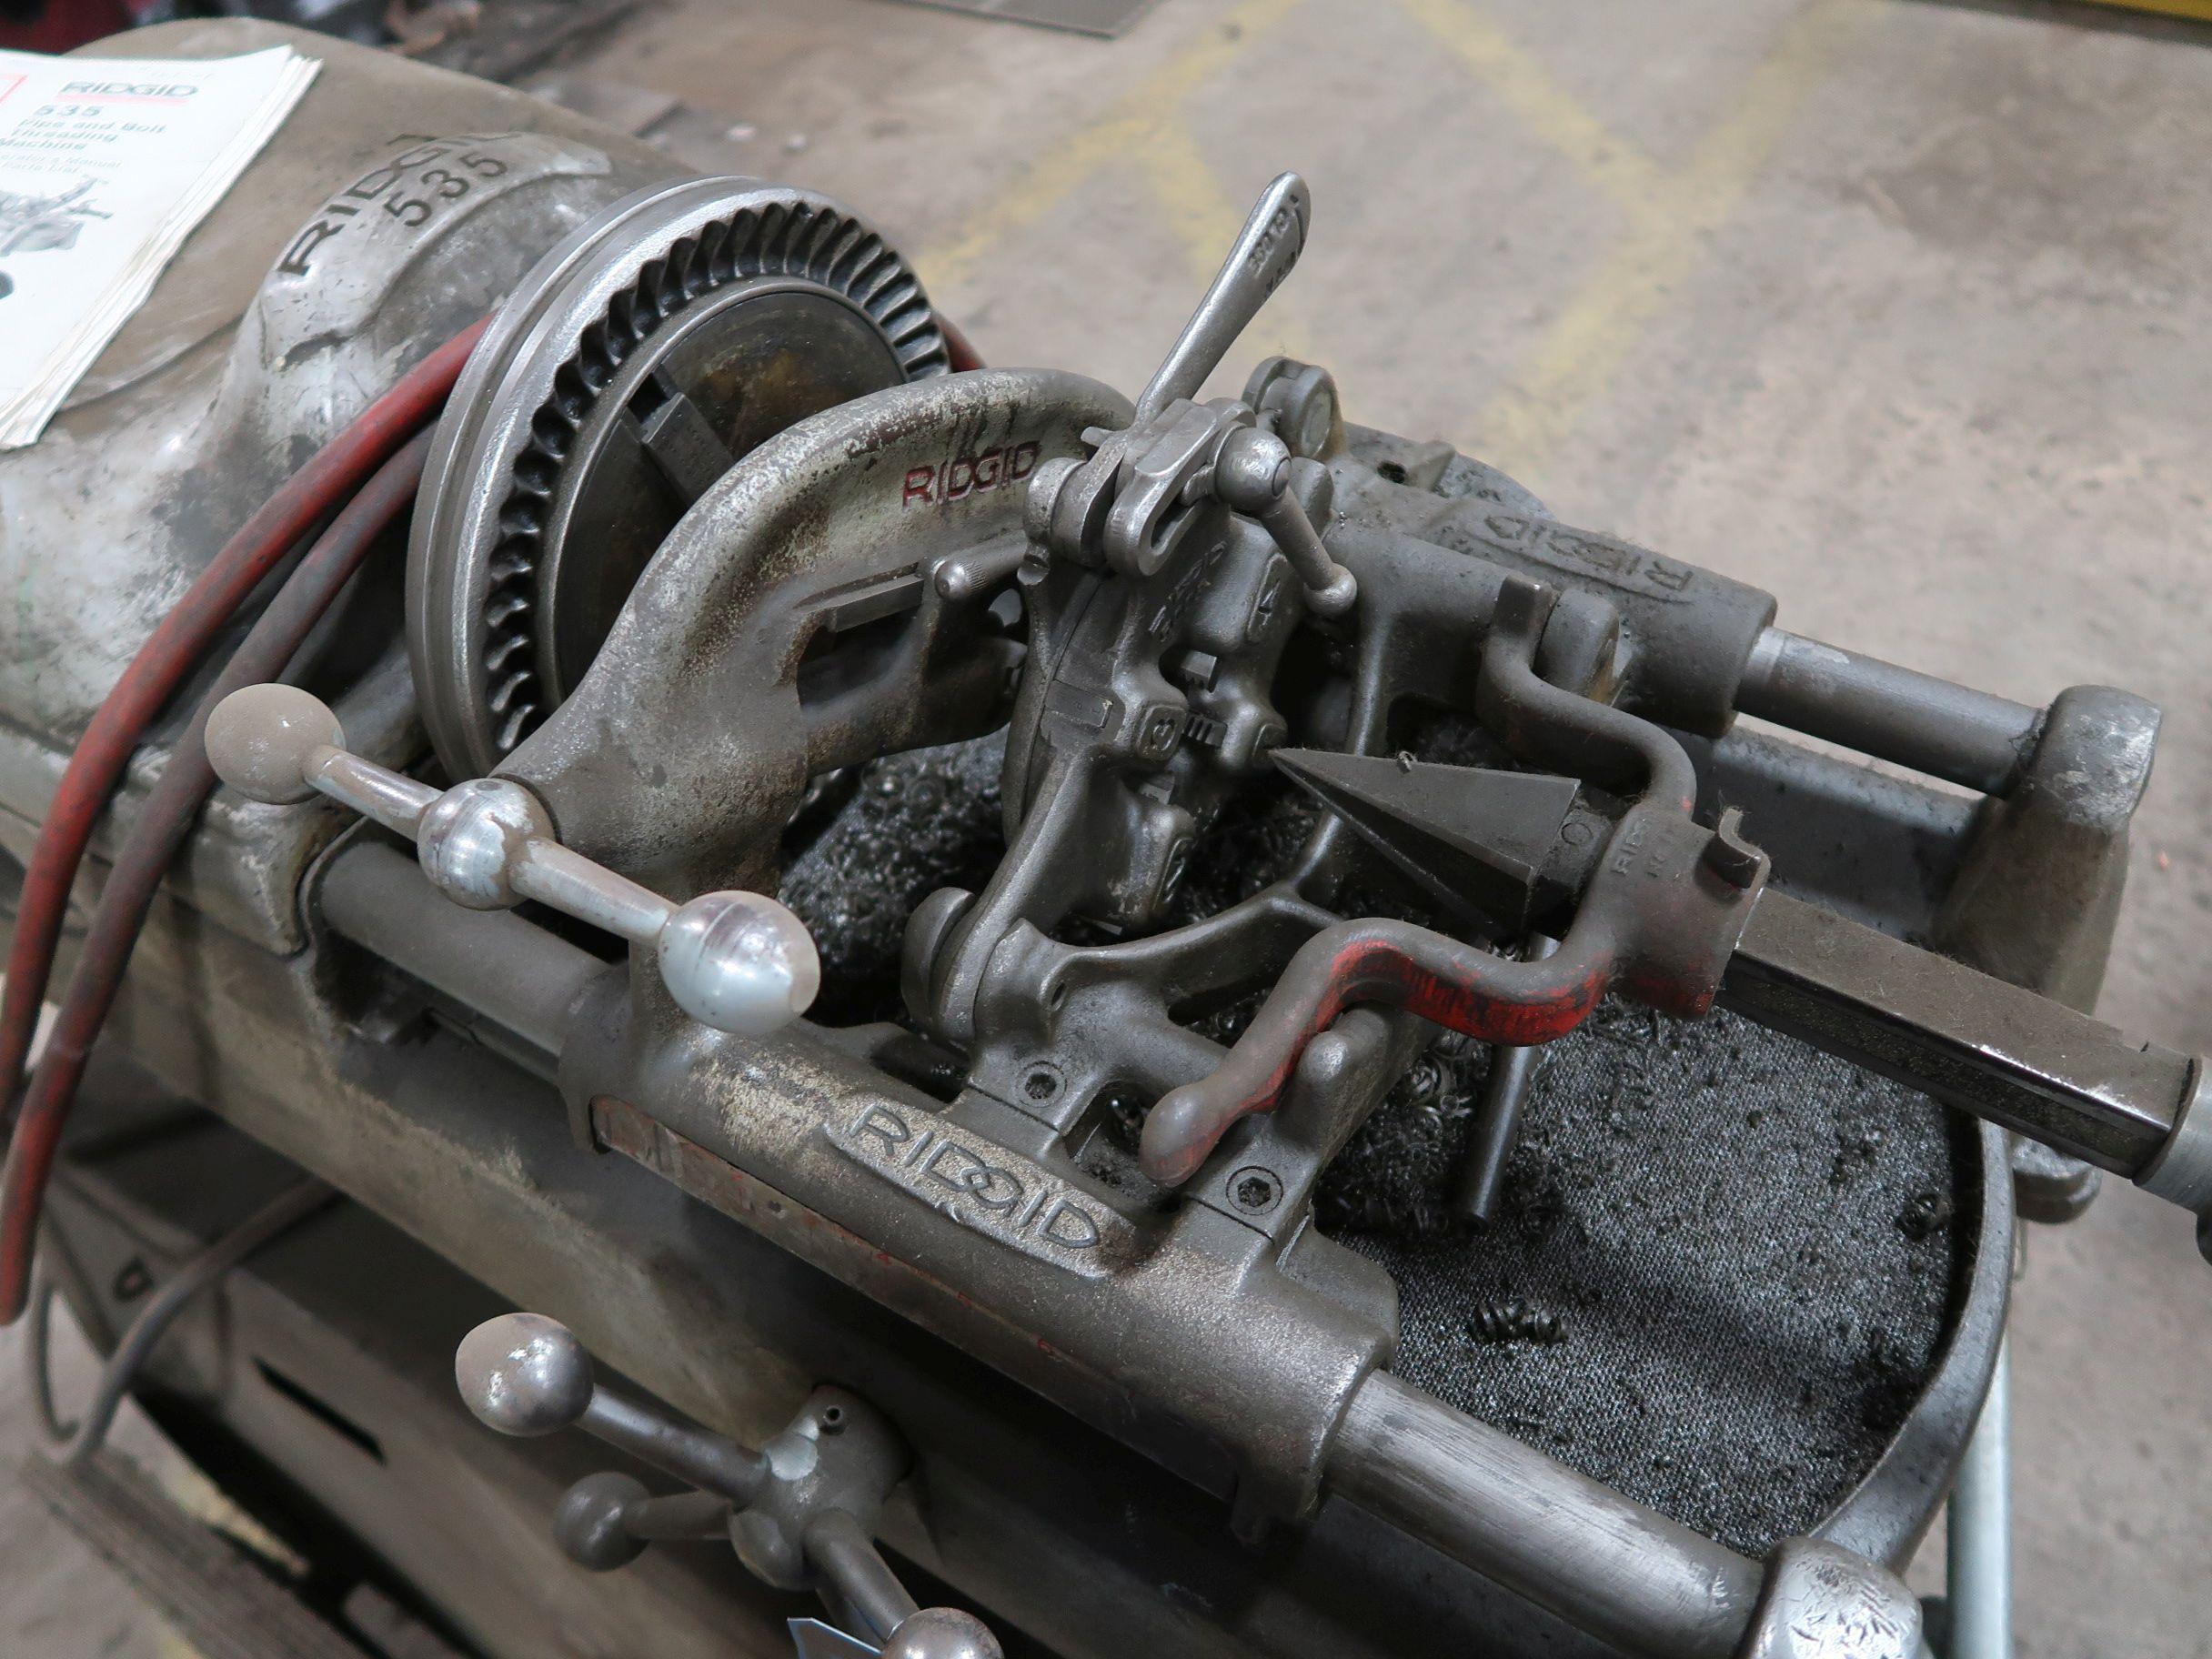 "RIGID MODEL 535 PORTABLE PIPE & BOLT THREADING MACHINE W/ RIGID NO. 450 1/8"" - 5"" TRISTAND - Image 3 of 4"